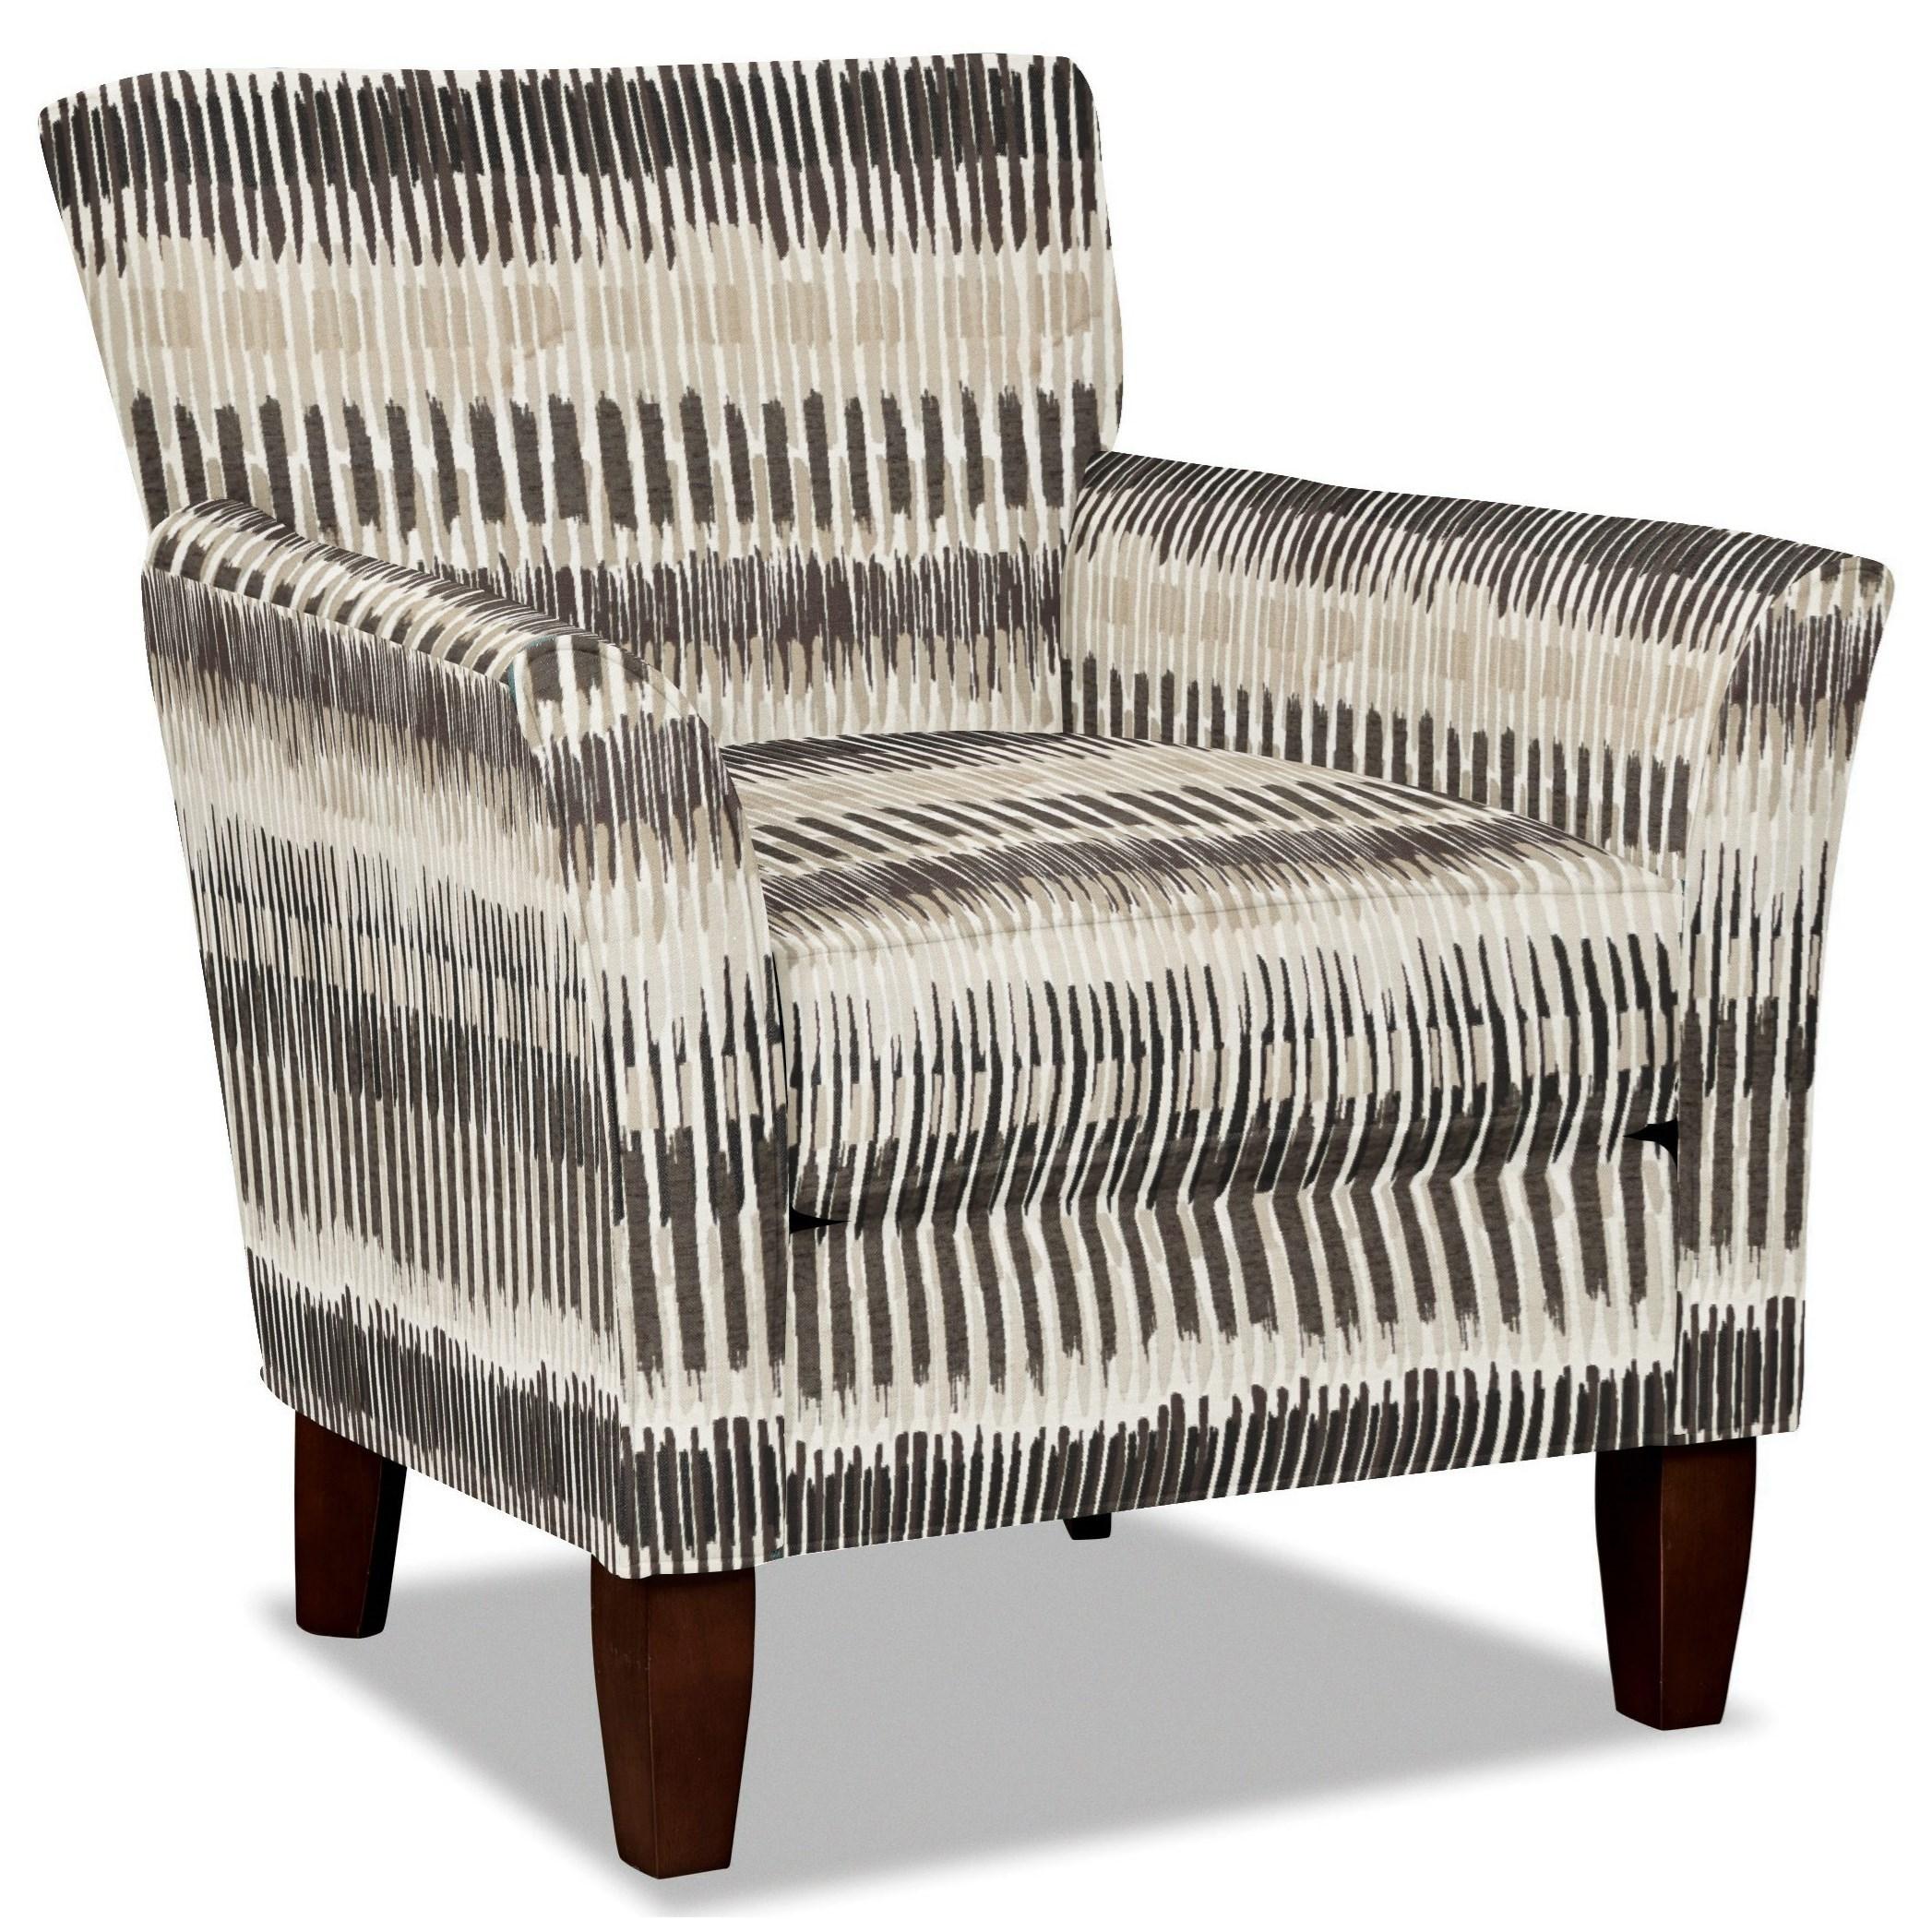 Craftmaster 060110 Accent Chair - Item Number: 060110-CARAVAN-10